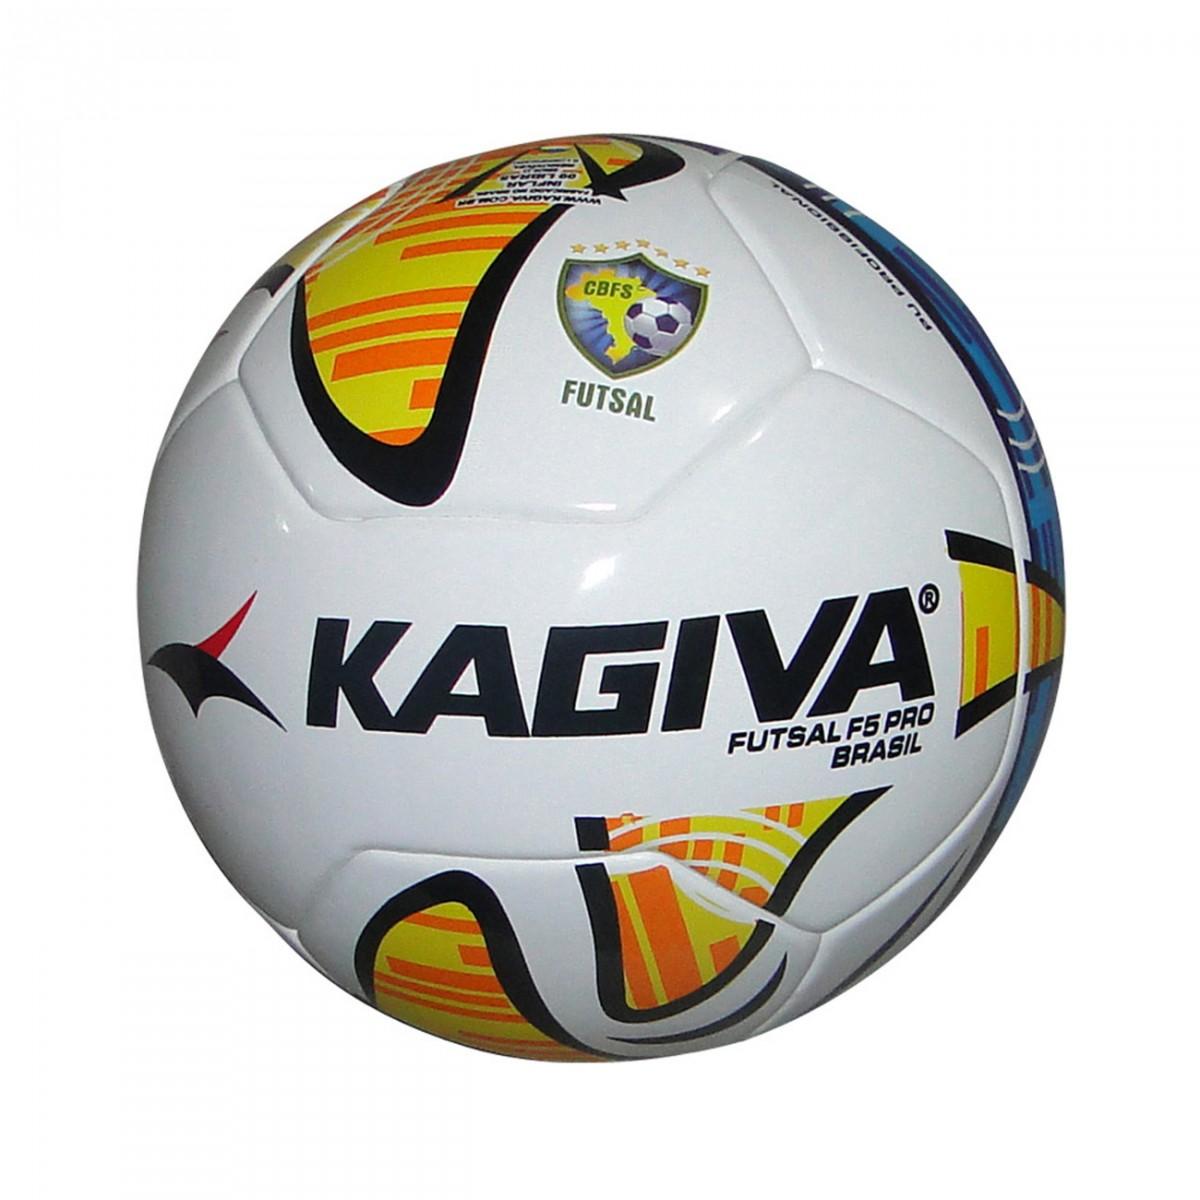 Bola Kagiva F5 Pro 8504-0 - Branco Azul Amarelo - Chuteira Nike ... 7cb46a1e957dc